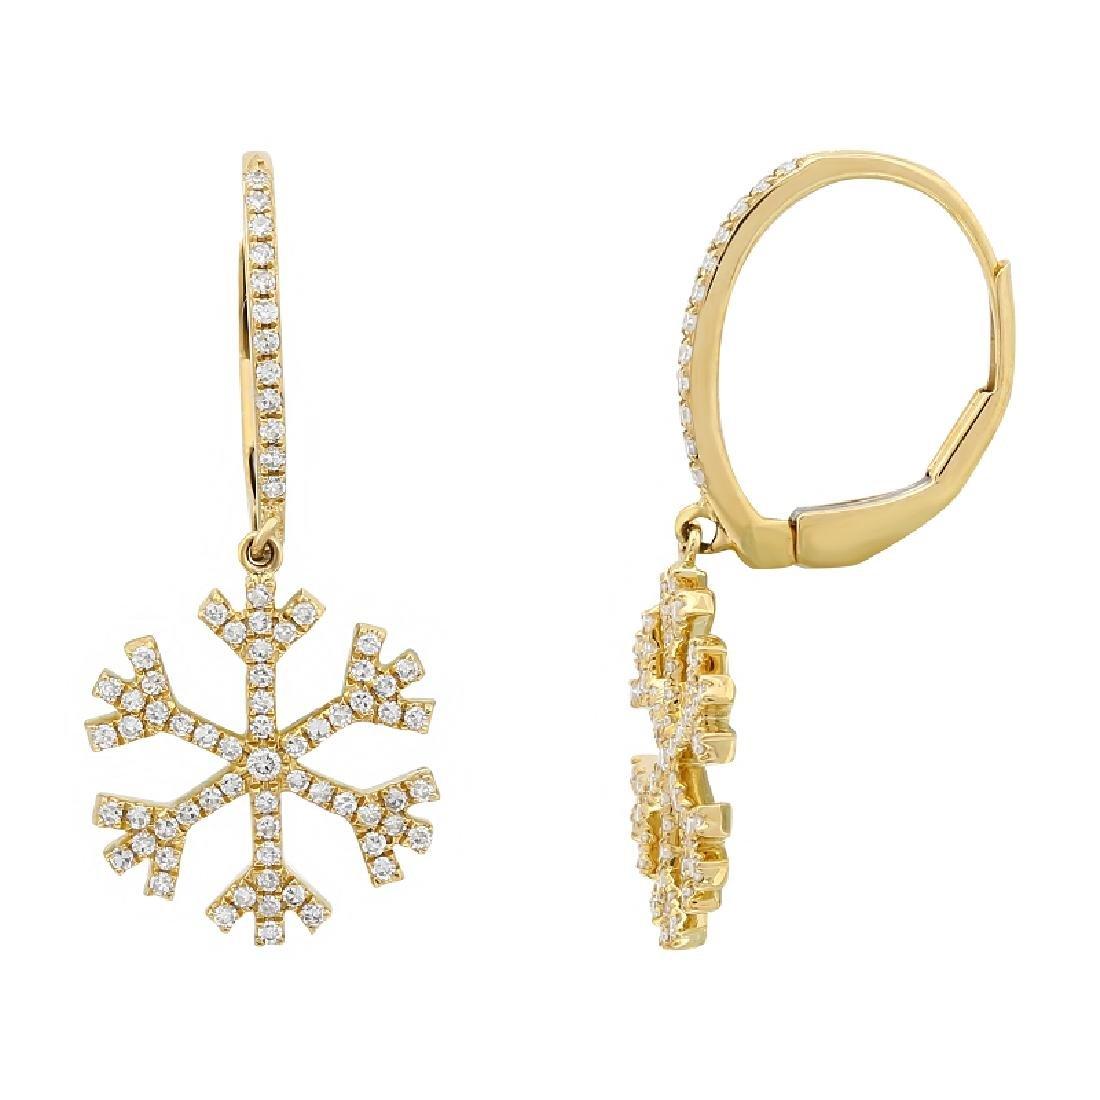 14KT Yellow Gold 0.4ctw Diamond Earrings L7943 - 2